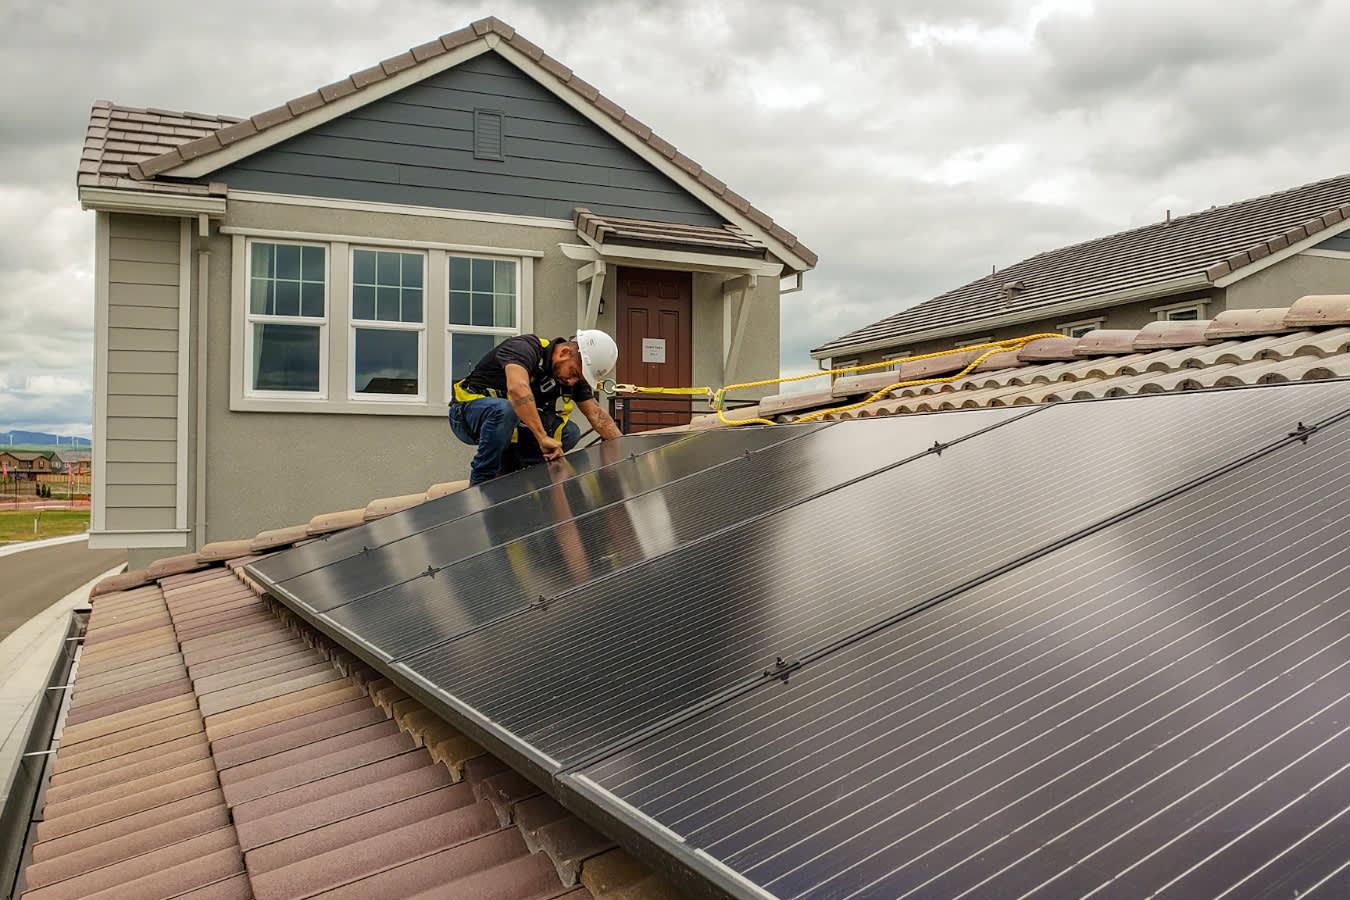 H/O: Solar installer PetersenDean